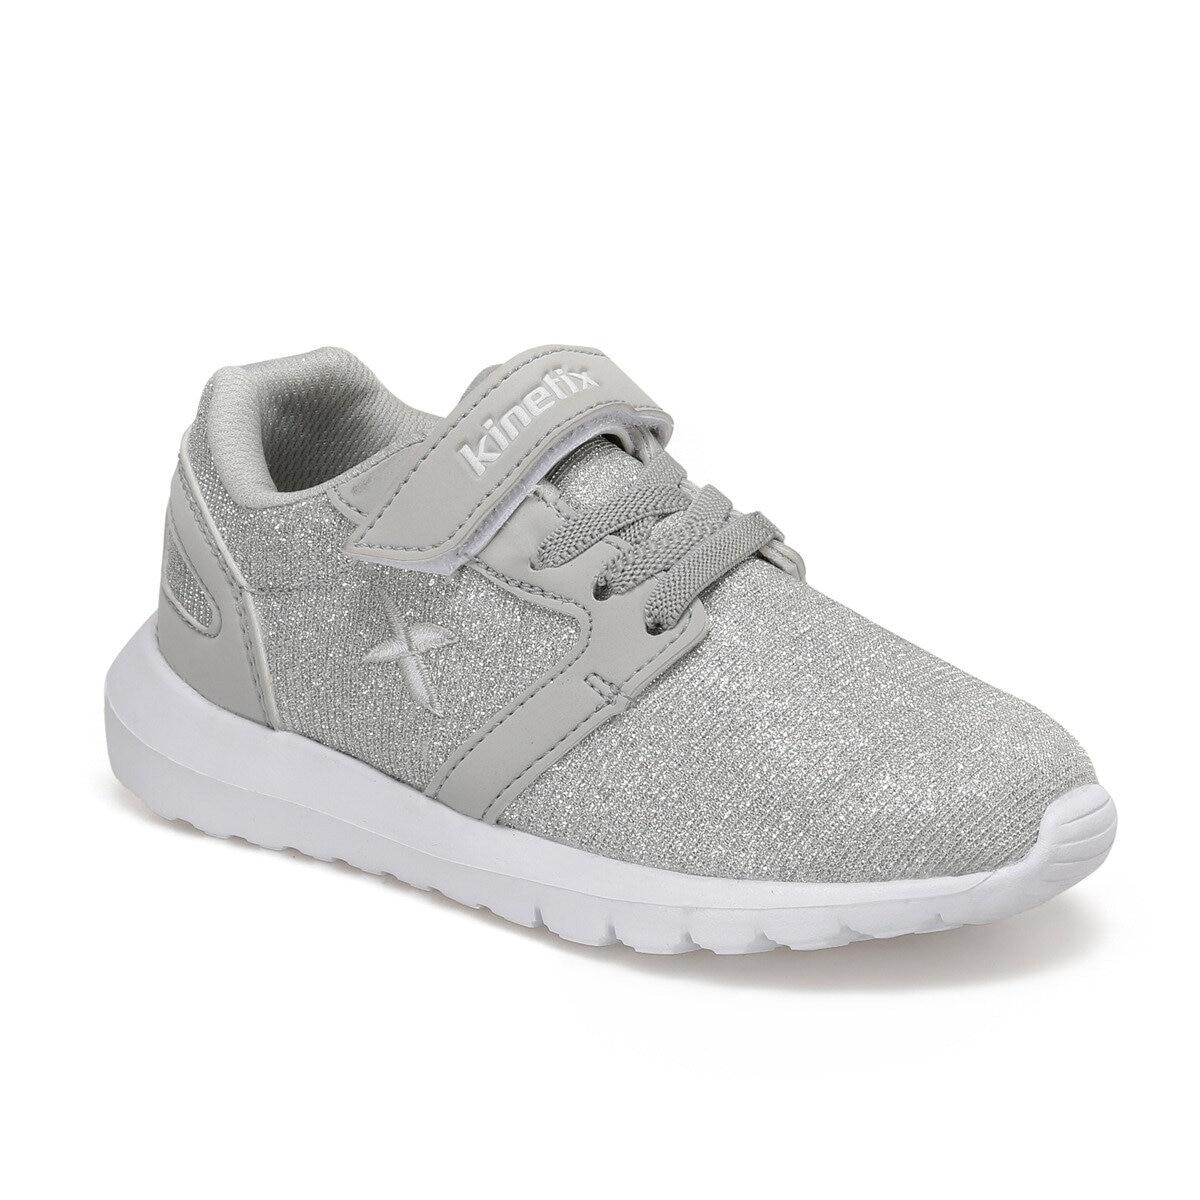 FLO NIHU Silver Female Child Sneaker Shoes KINETIX